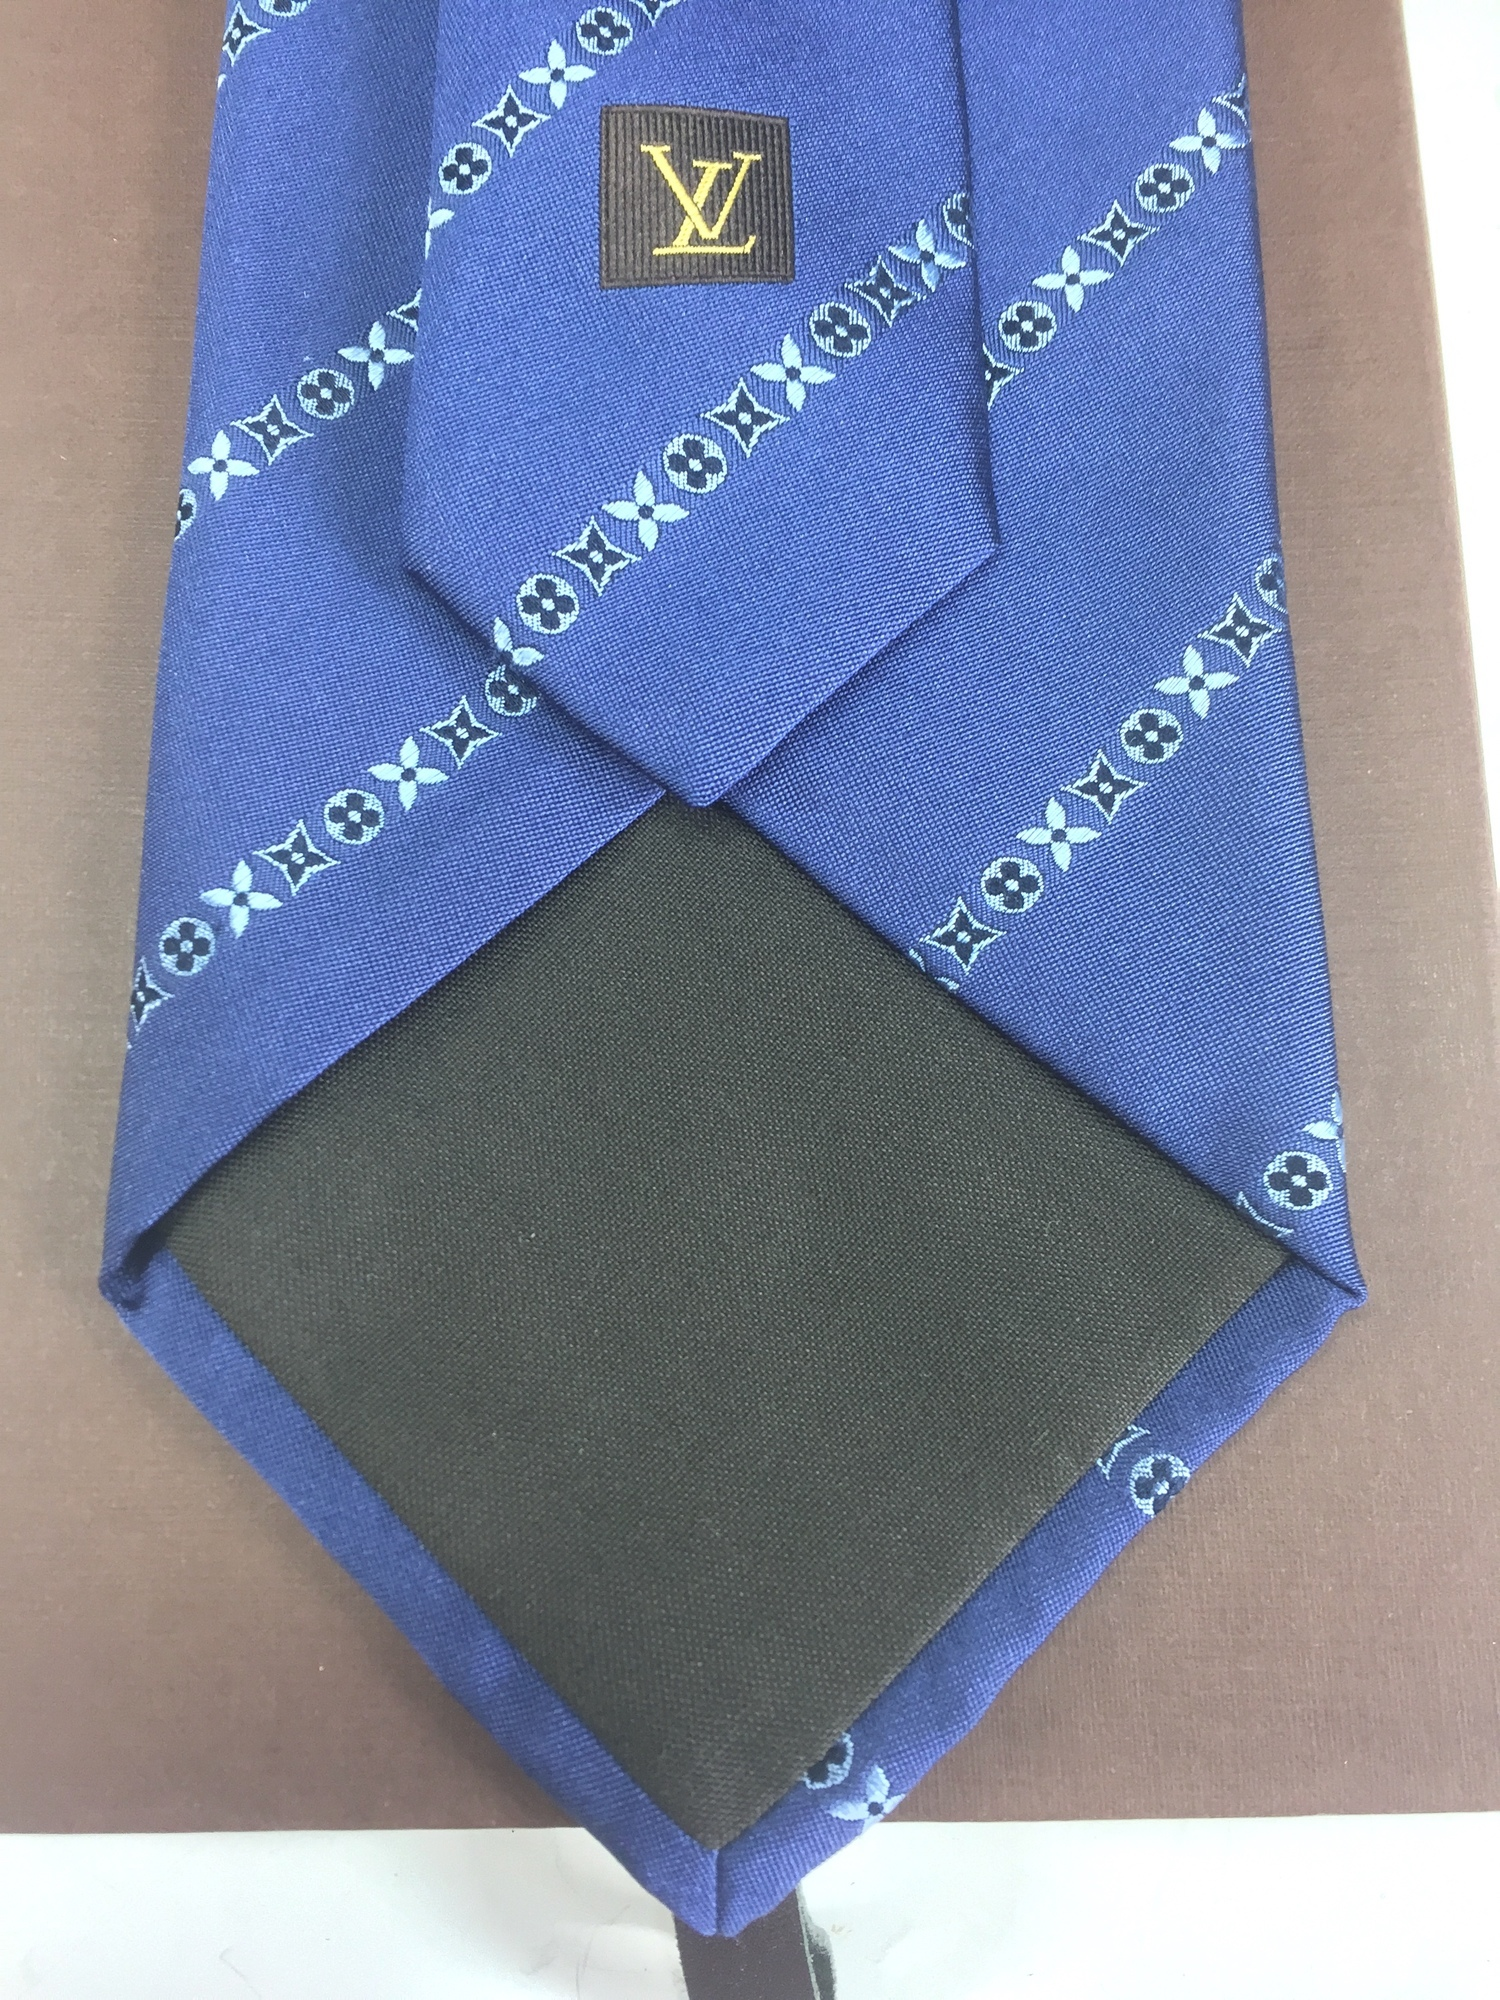 657274f07701 Special price Louis Vuitton Boys,Men Cravat Silk Blue M73007 N-7   eBay